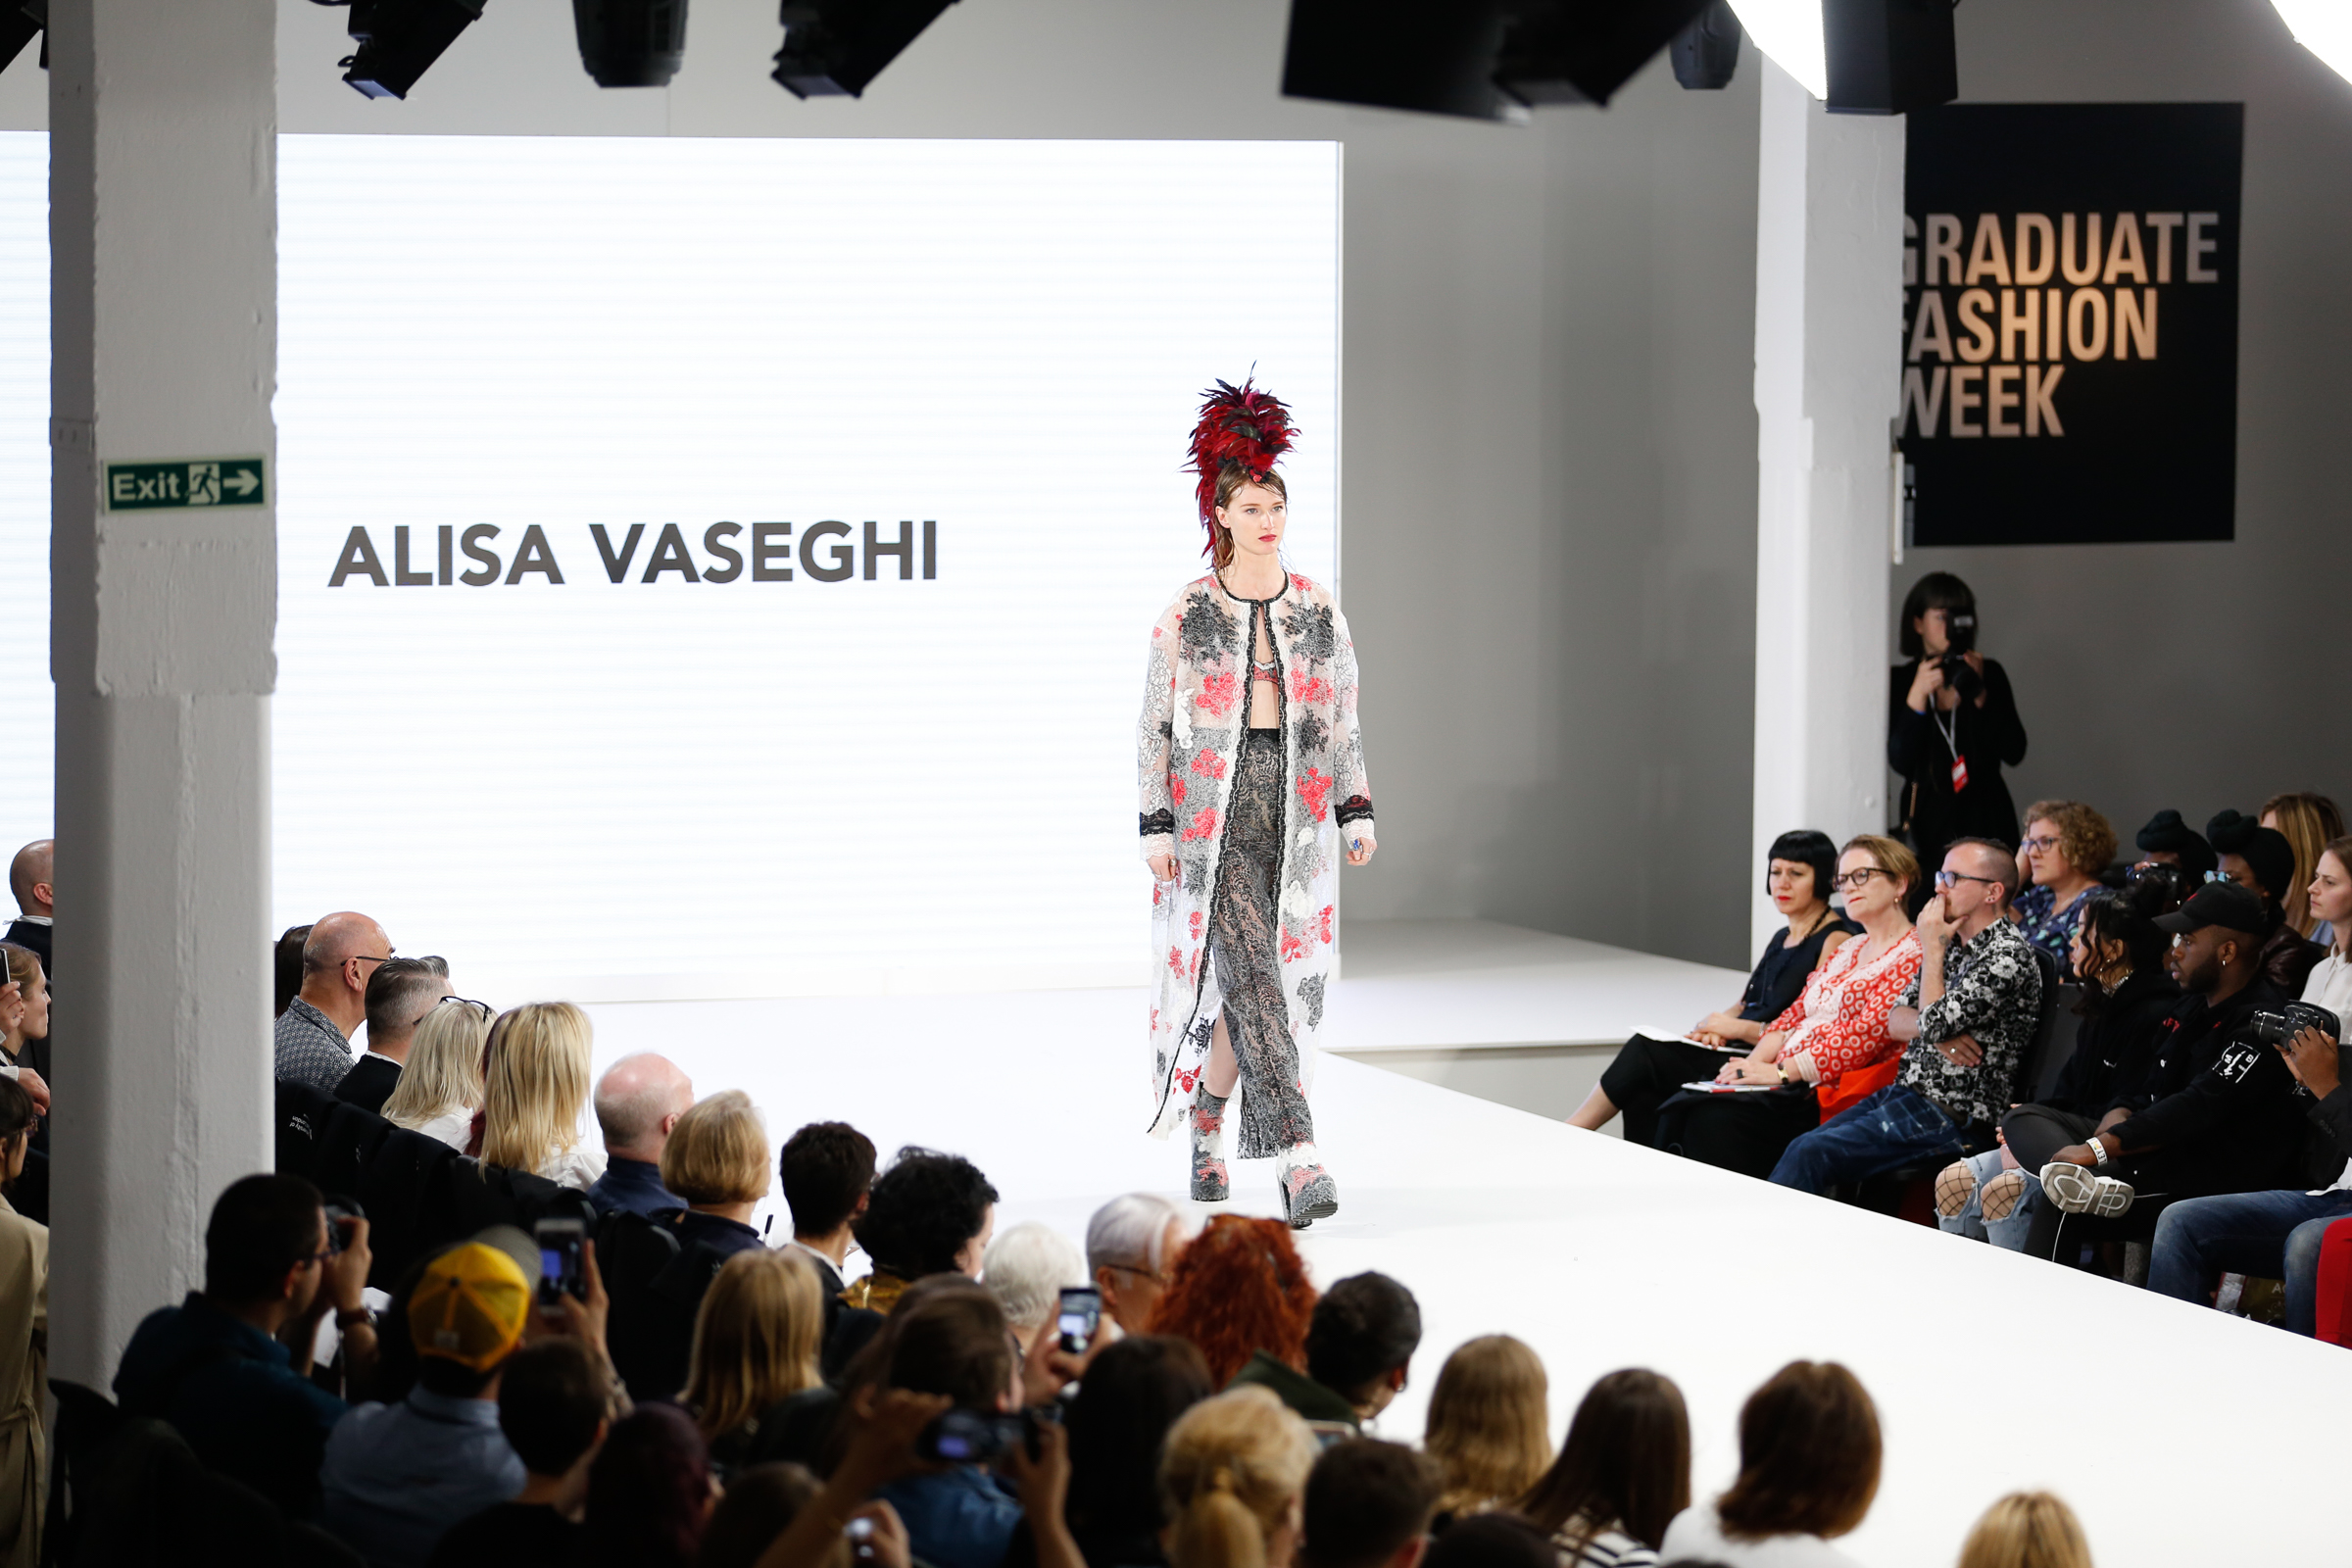 04-06 University of East London Alisa Vaseghi images by Kathrin Werner 001.jpg